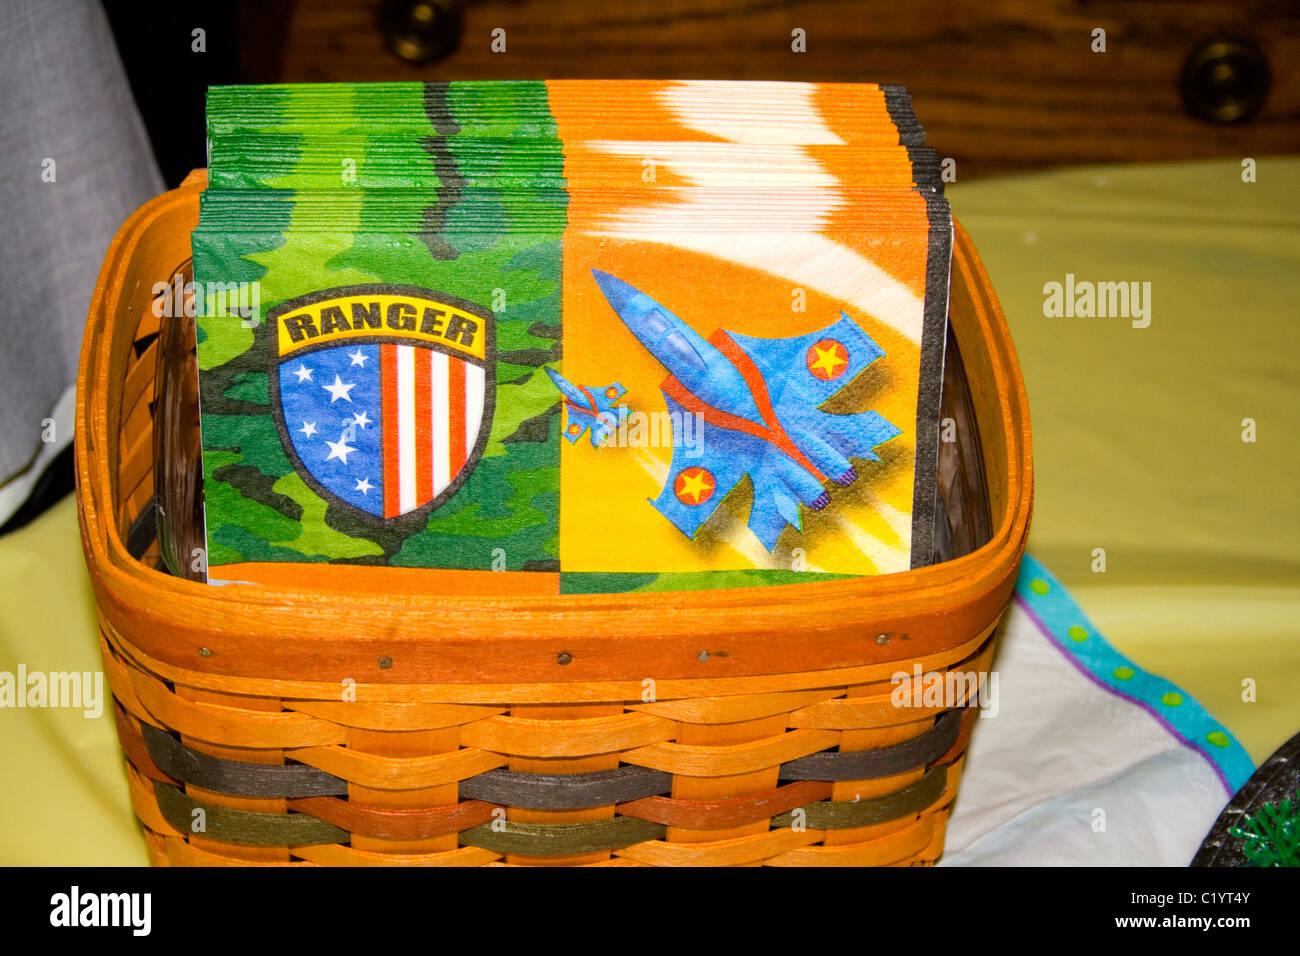 Ranger napkins for Vietnam pilot's birthday party. St Paul Minnesota MN USA - Stock Image